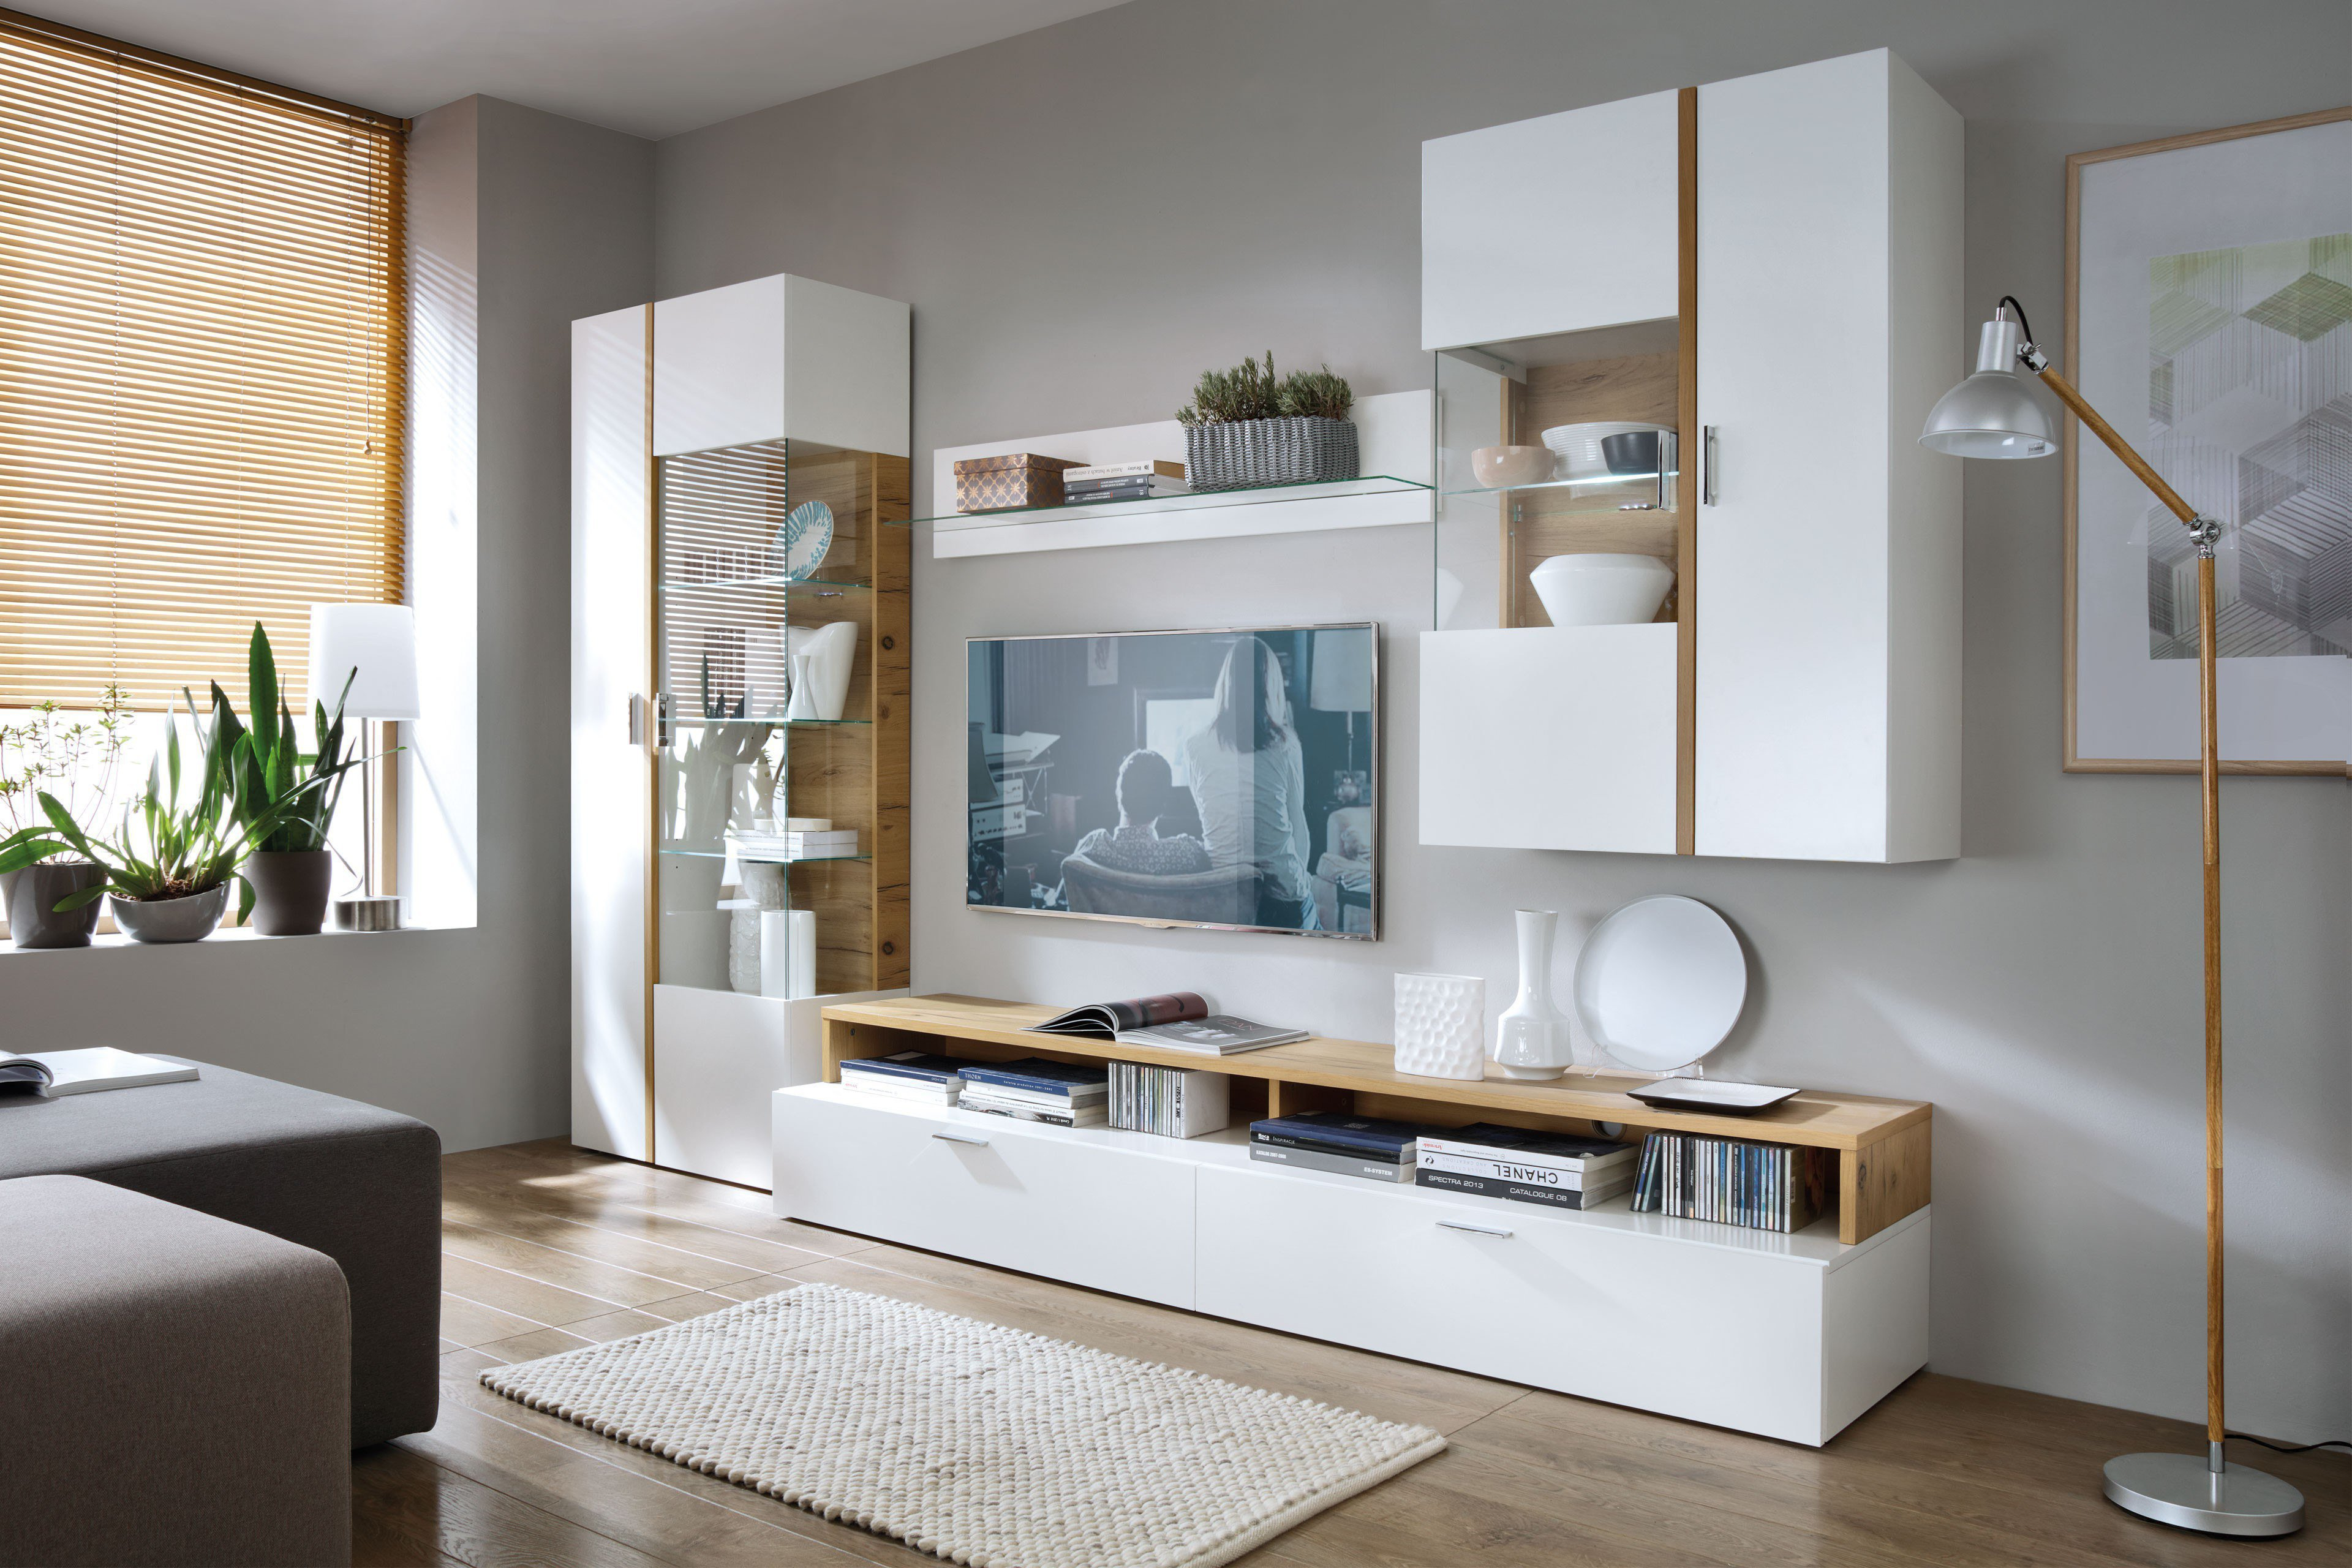 wohnwand mit beleuchtung wohnwand june inkl with wohnwand. Black Bedroom Furniture Sets. Home Design Ideas